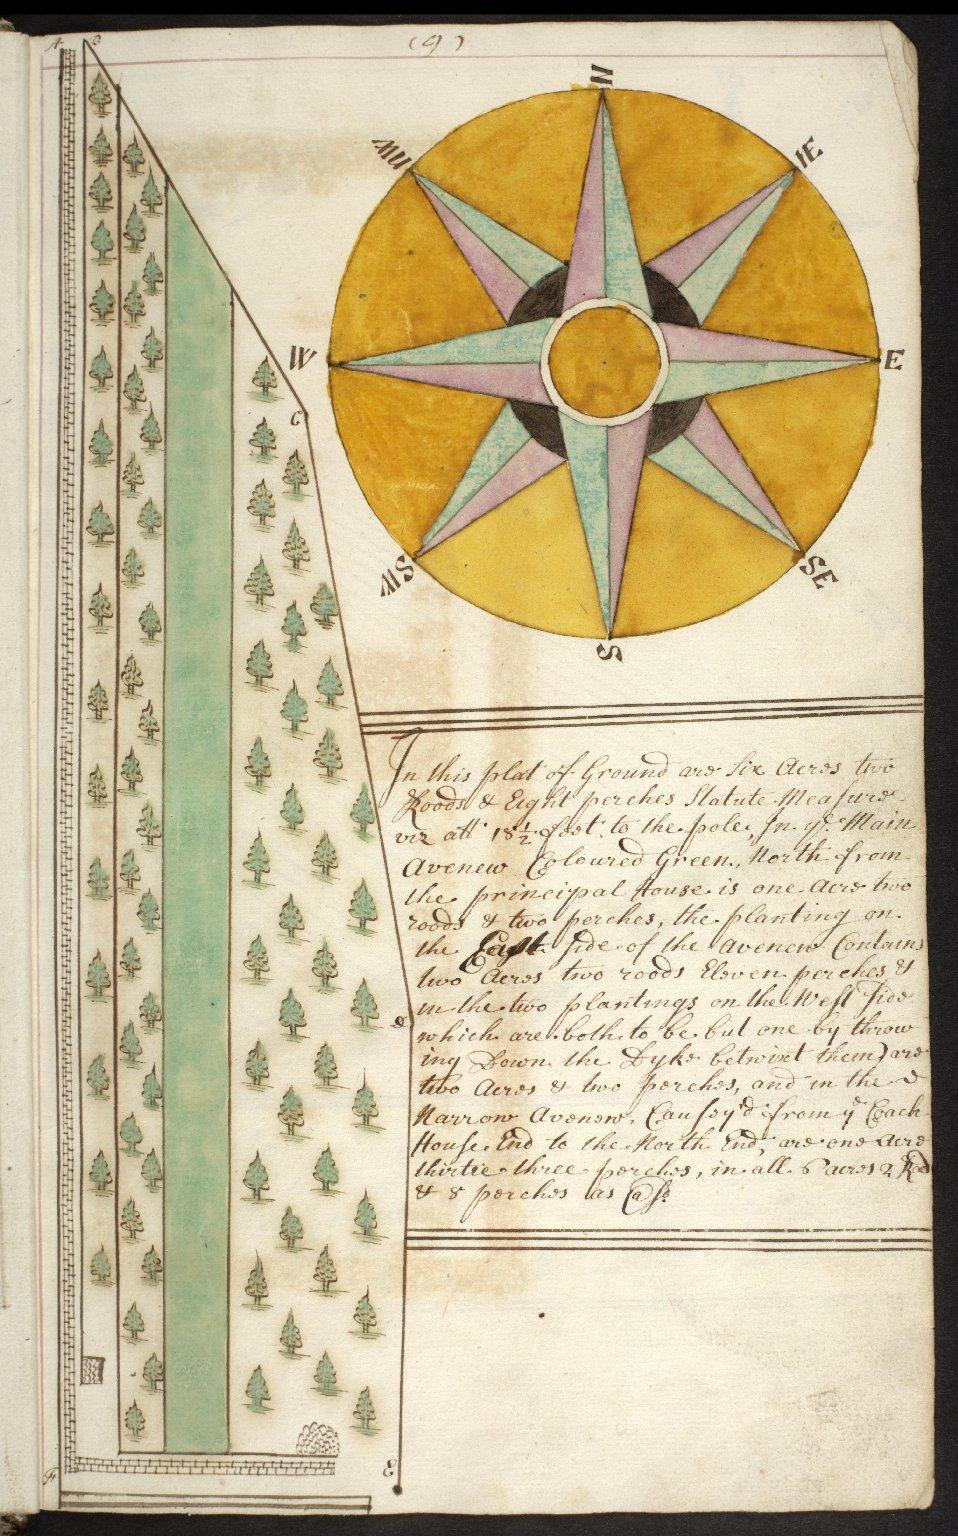 Sir John Rutherfurd of the Ilk His Book 1724 [05 of 24]